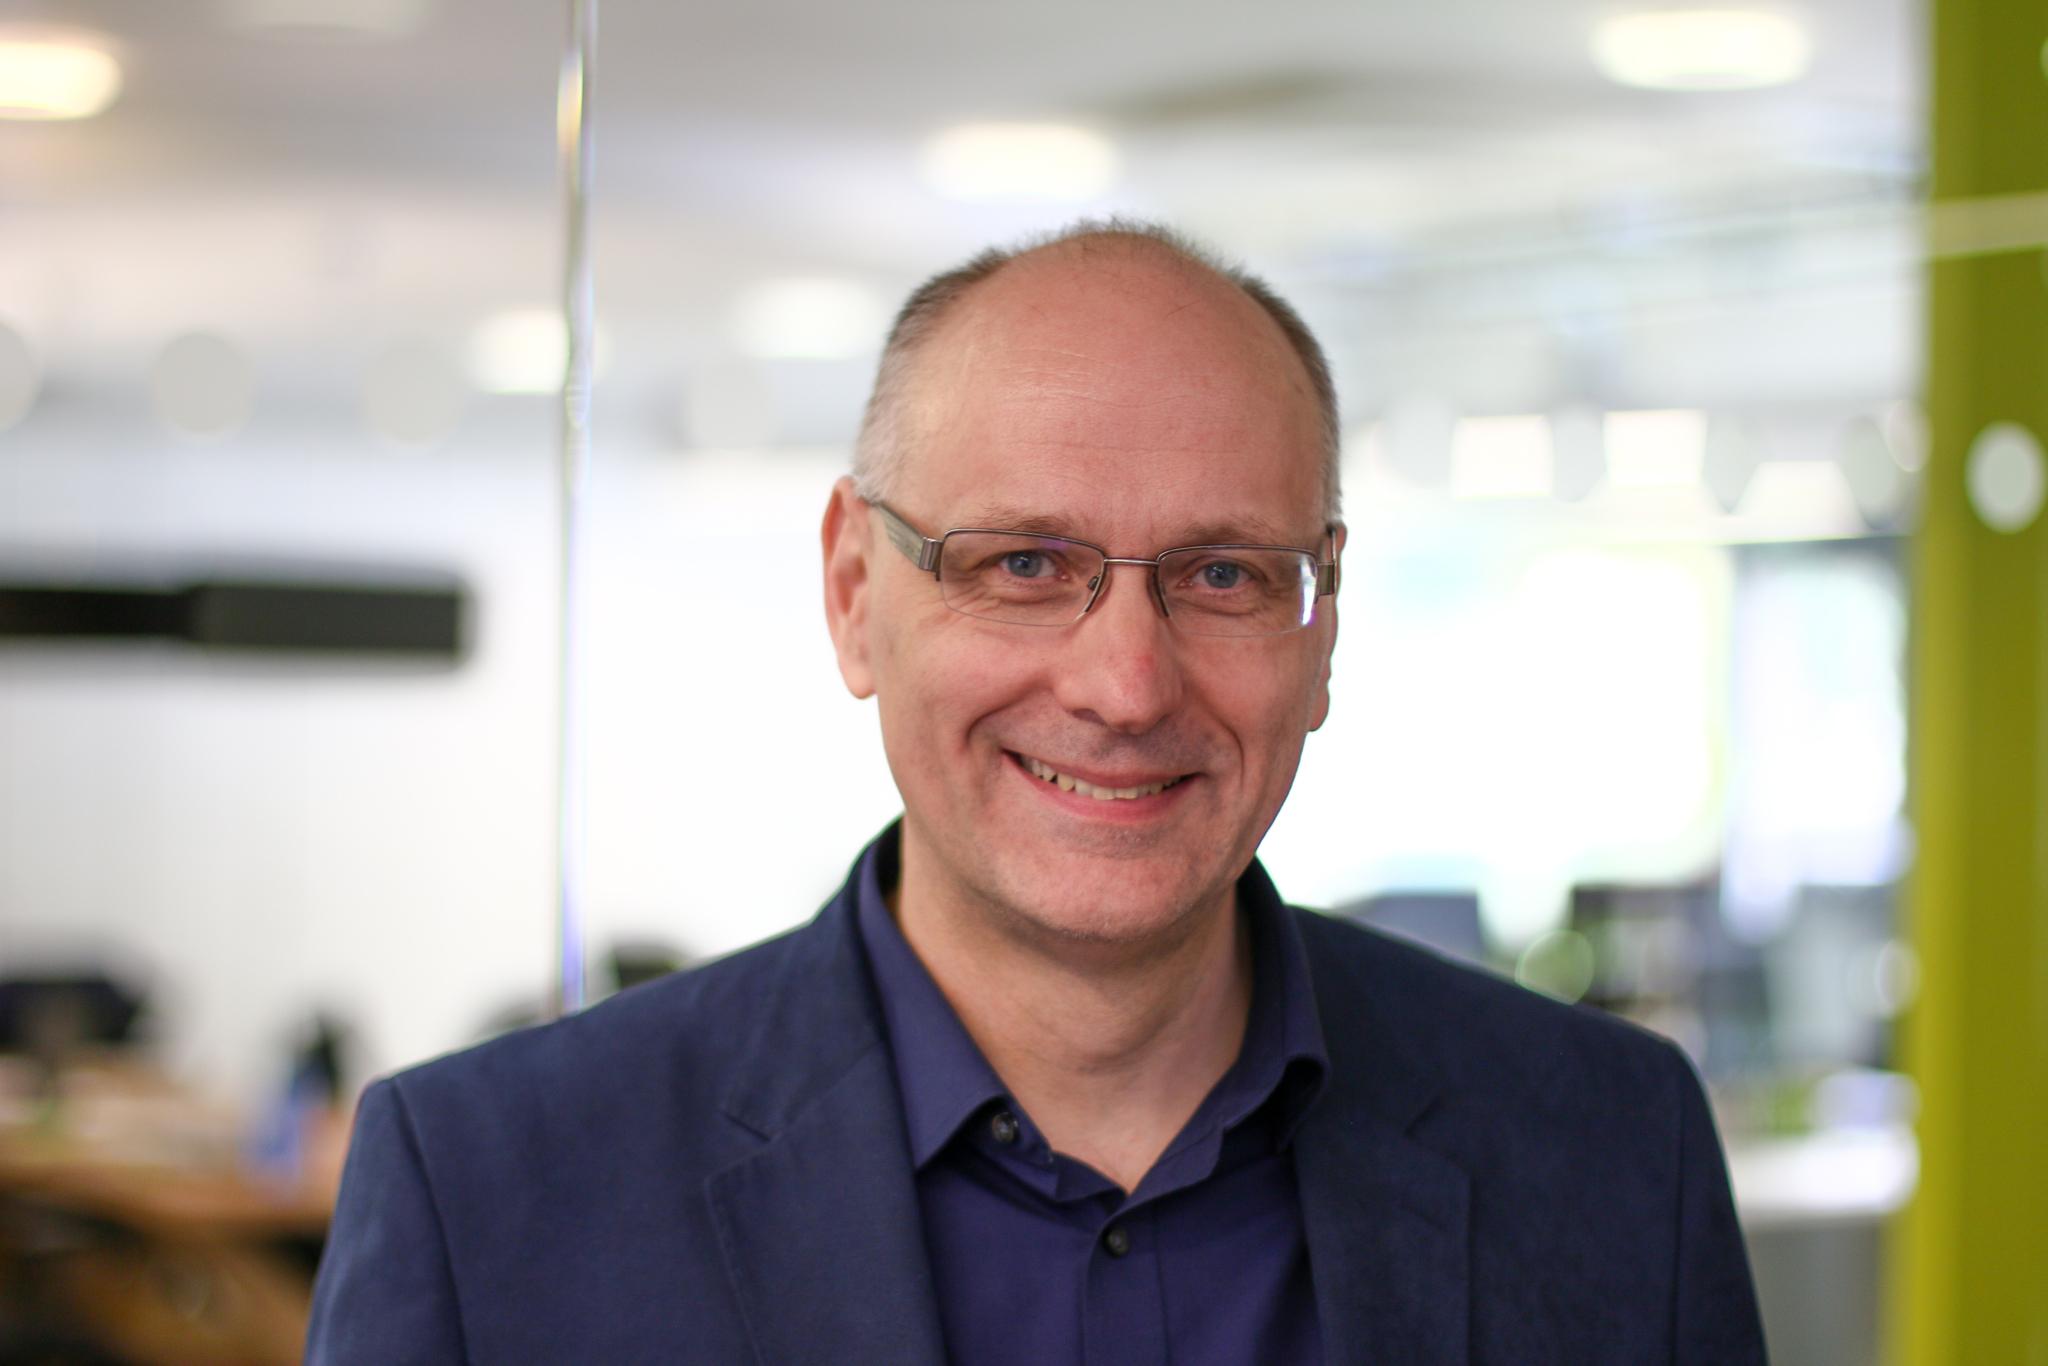 David Hilborn